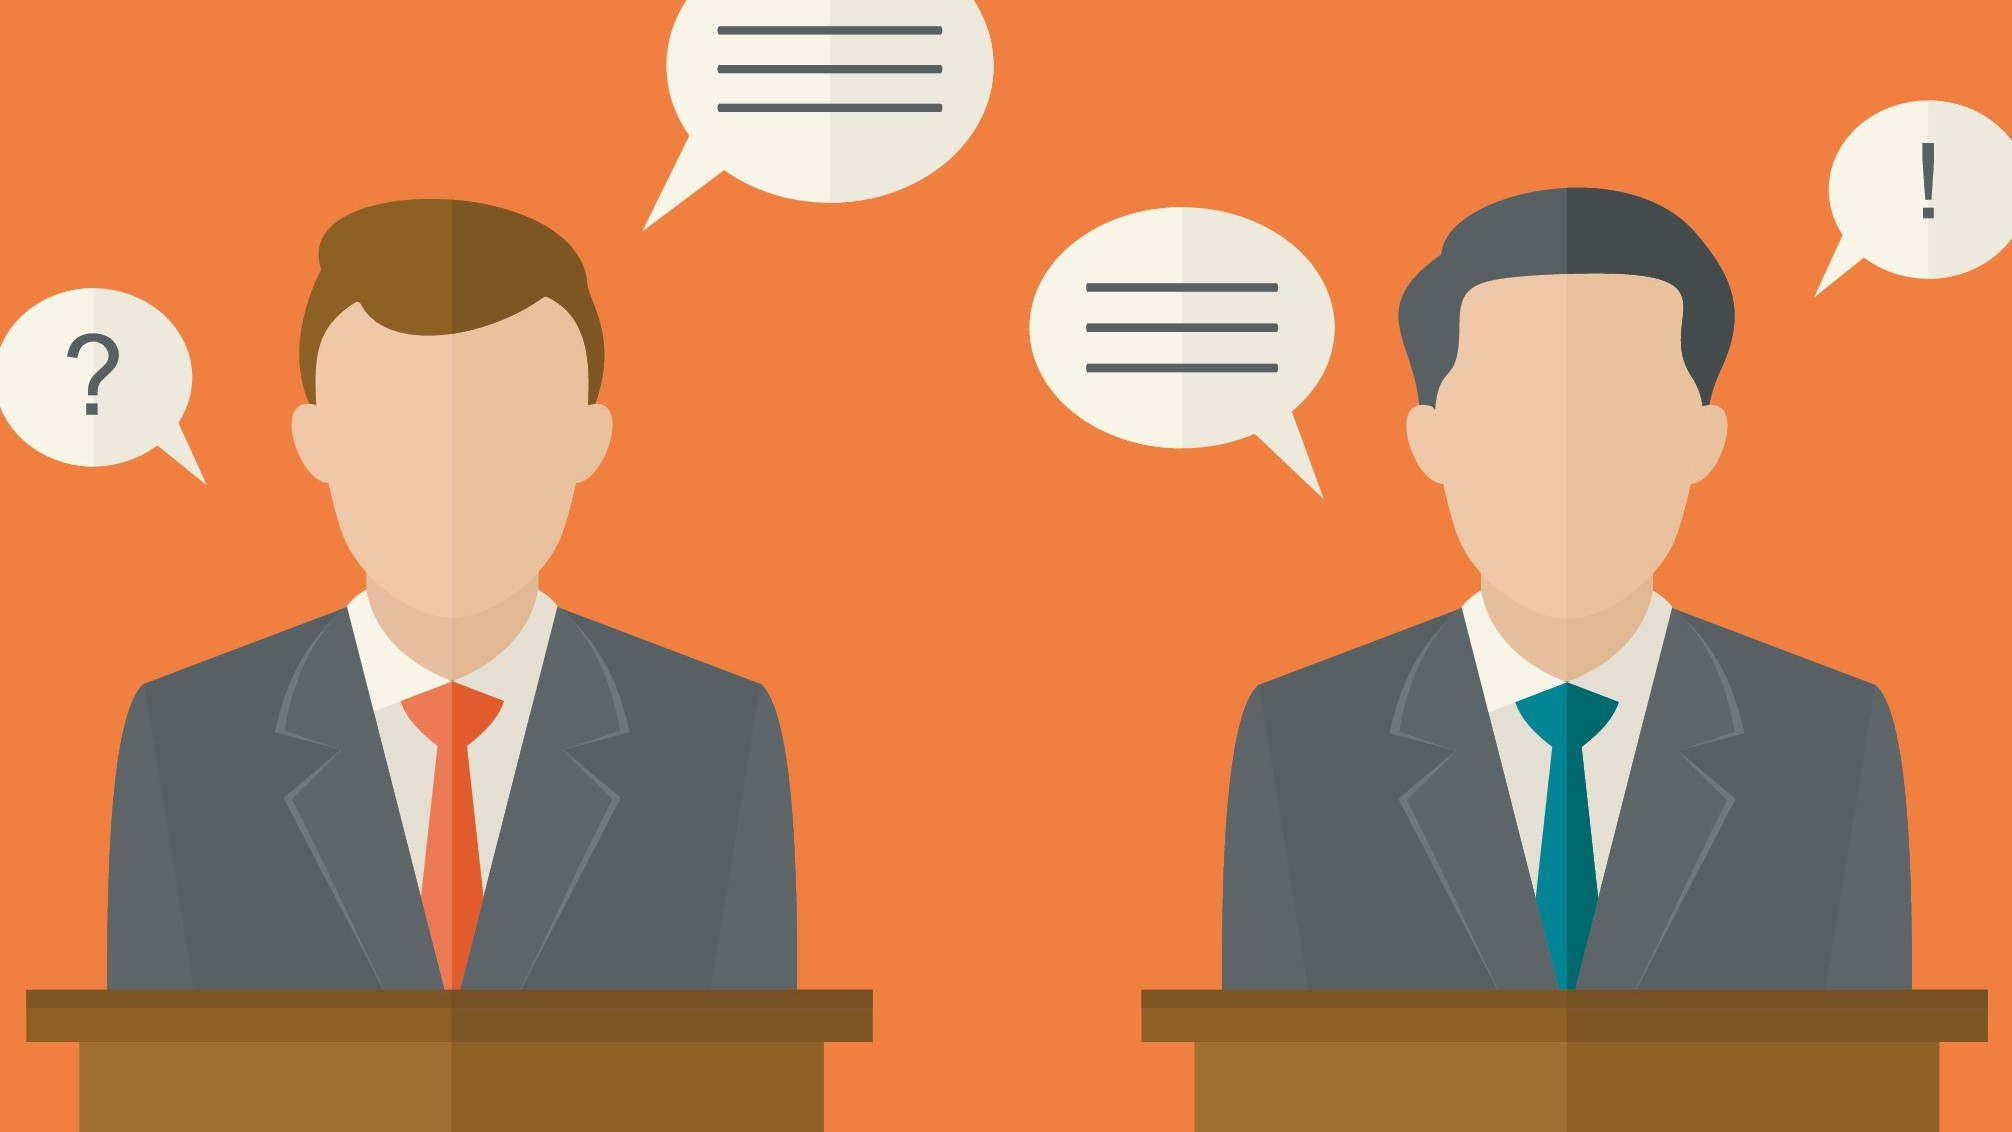 Candidates speaking